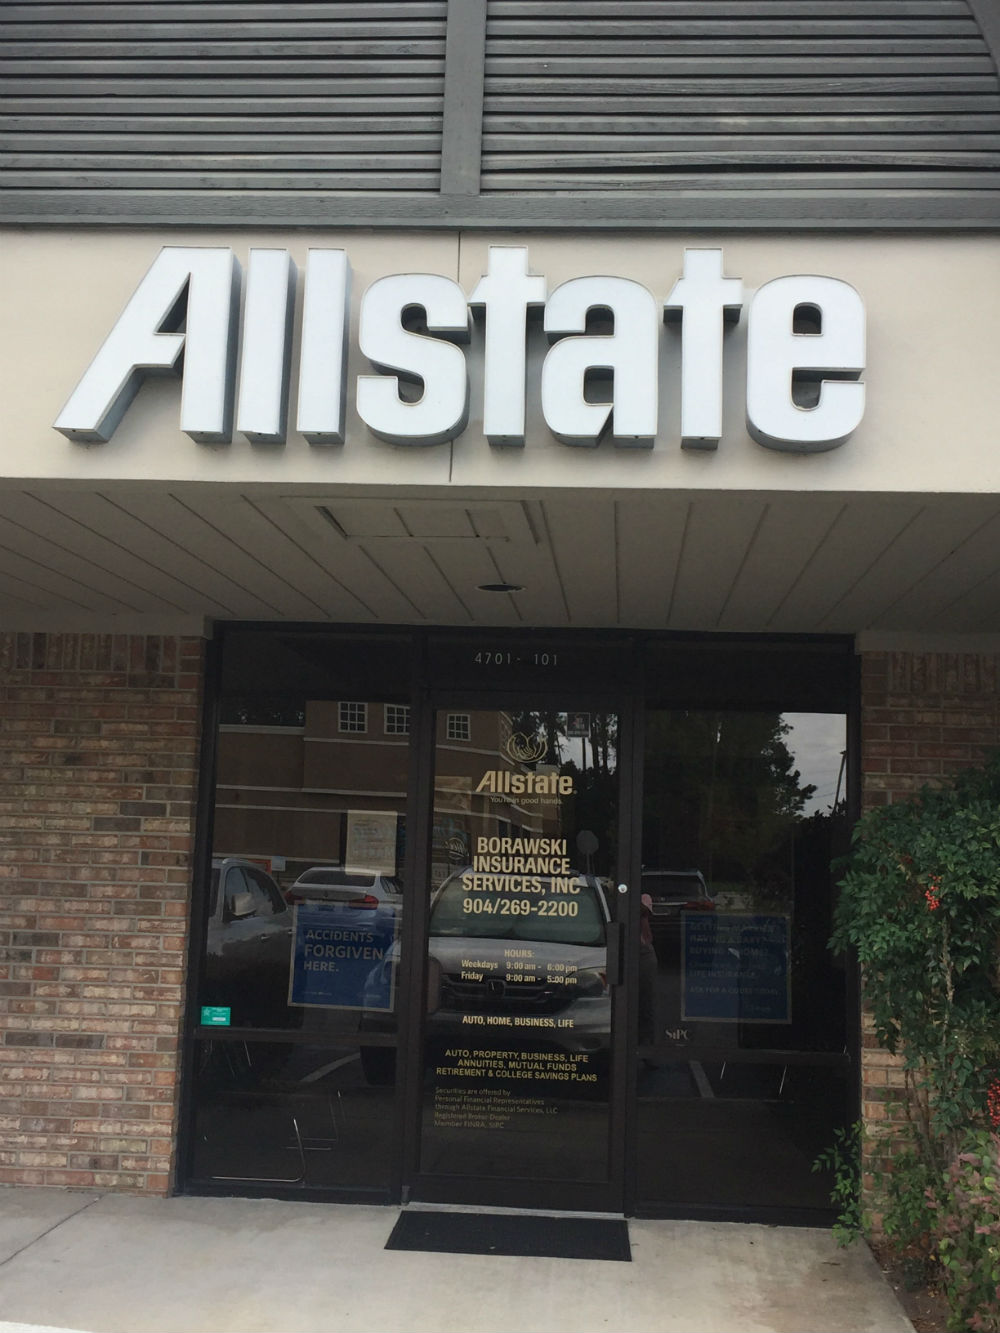 Allstate Insurance Agent: Stan R. Borawski image 3